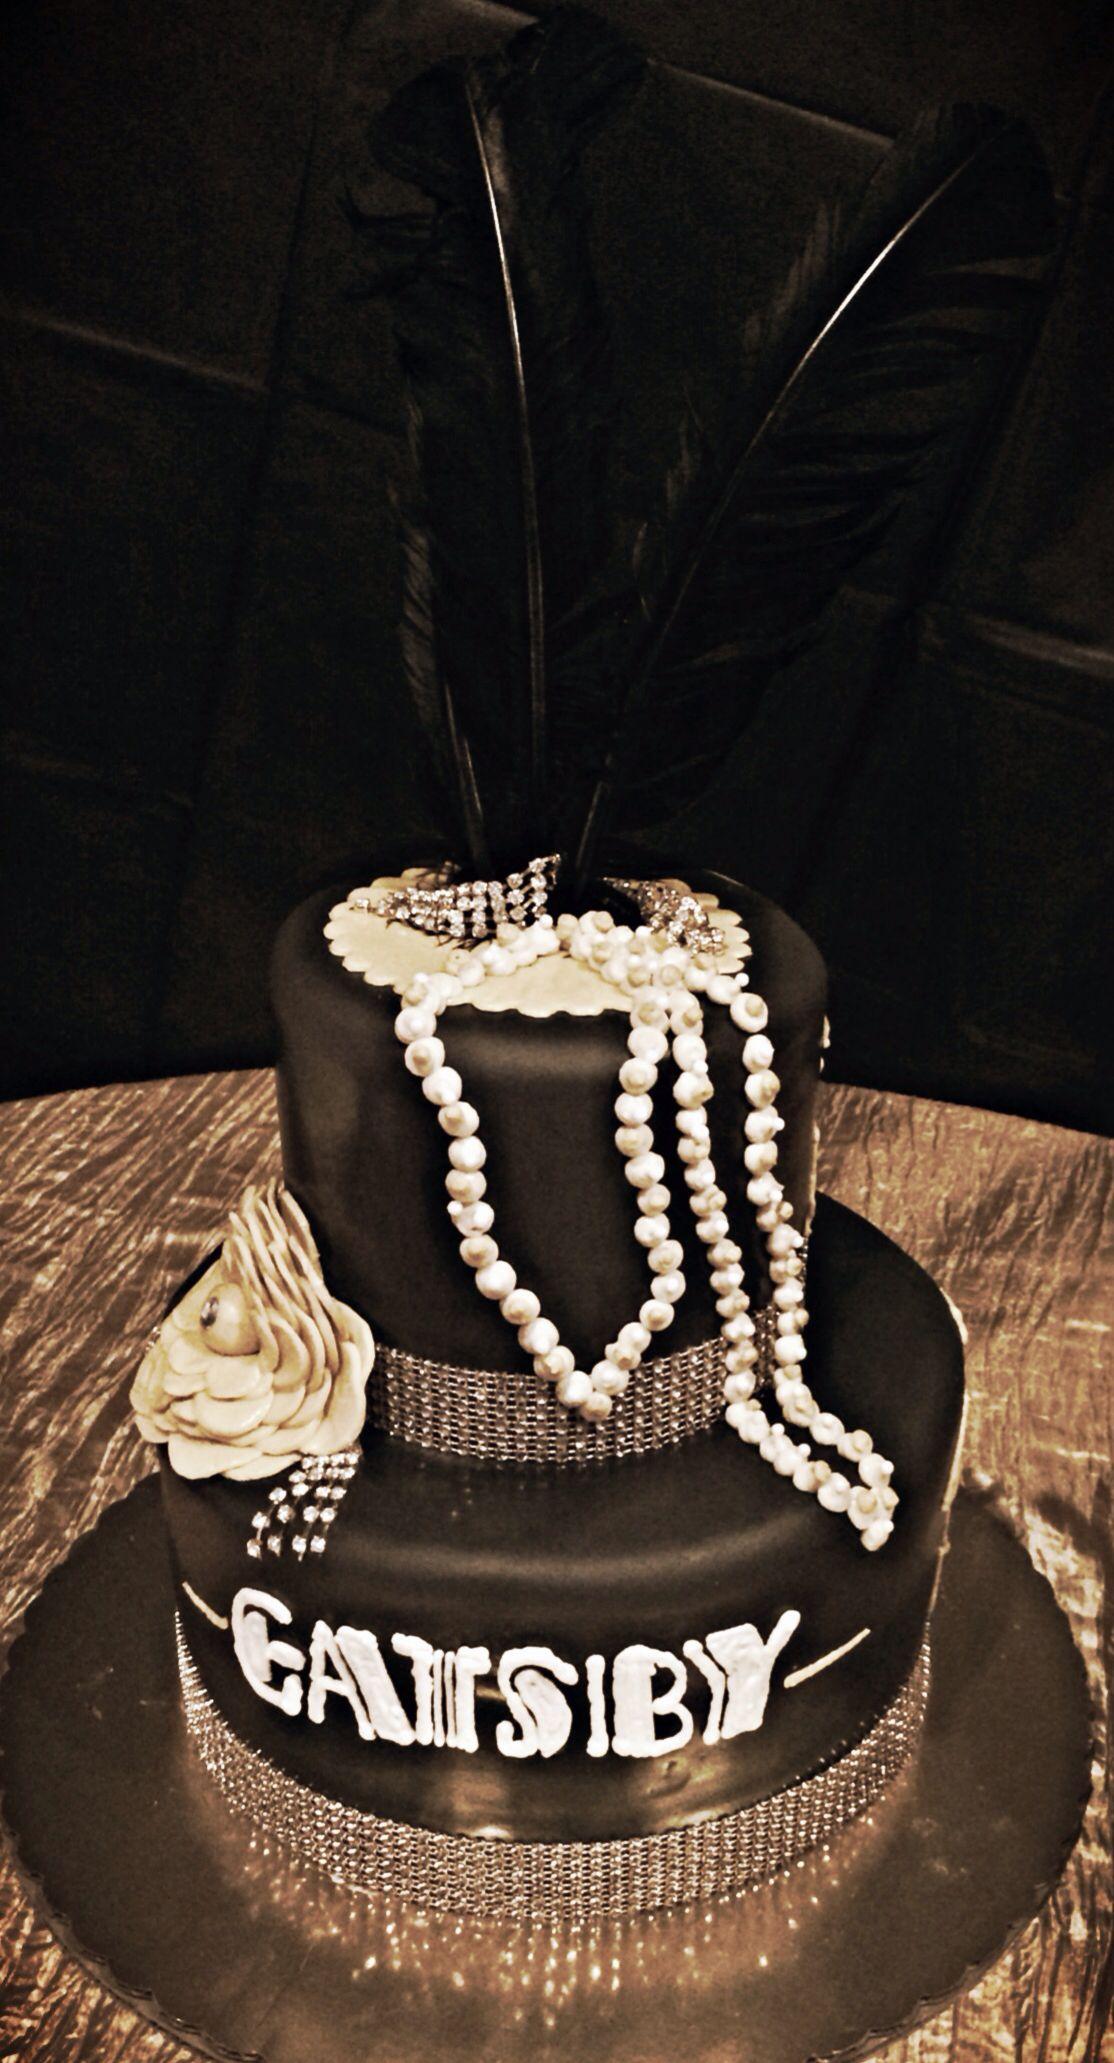 Great Gatsby wedding cake cool Wedding cakes